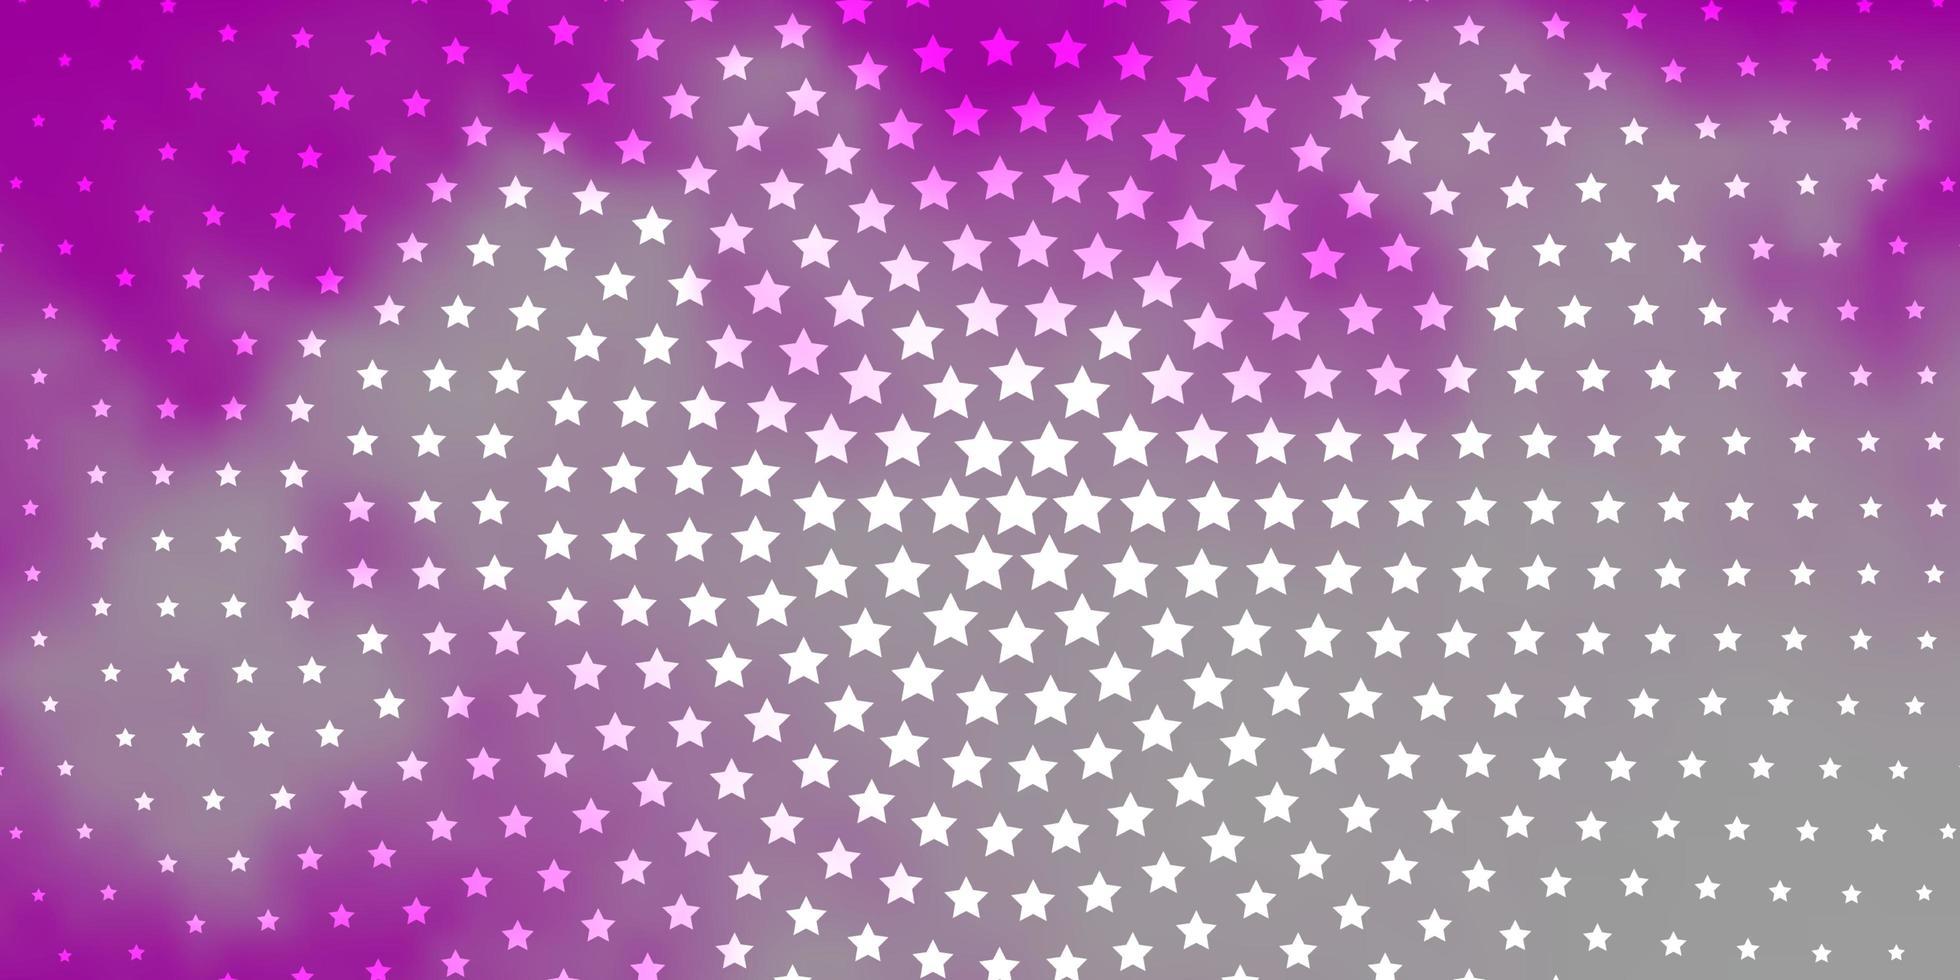 fundo vector rosa claro com estrelas pequenas e grandes.